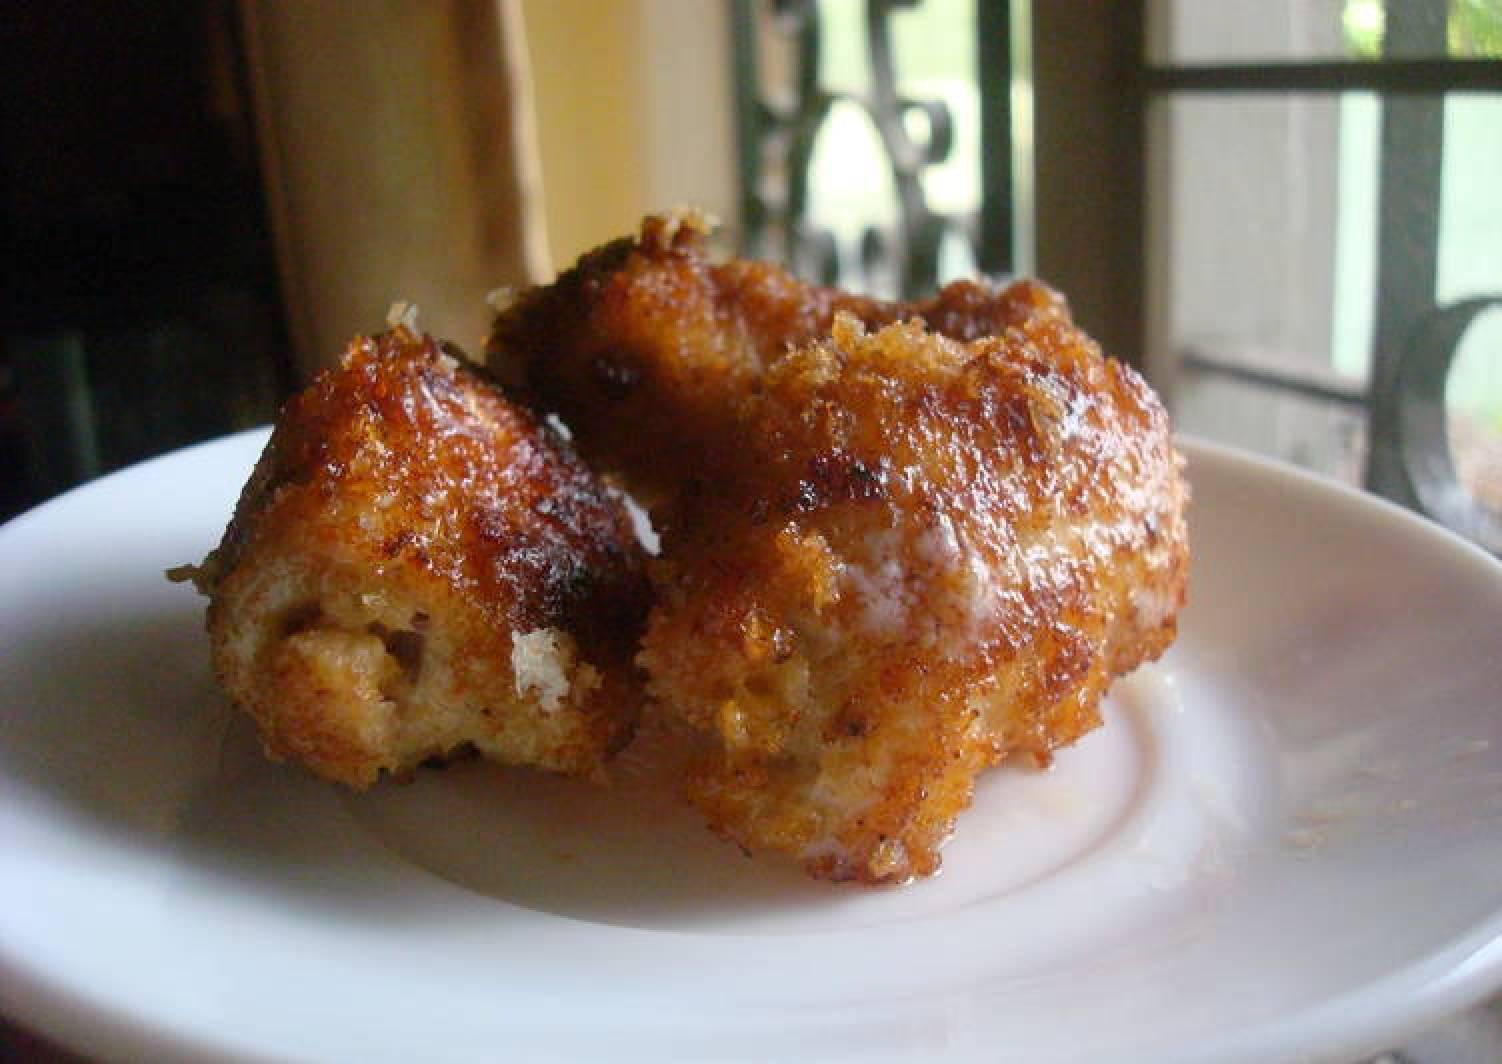 Cheesy chilli garlicky stuffed chicken breast